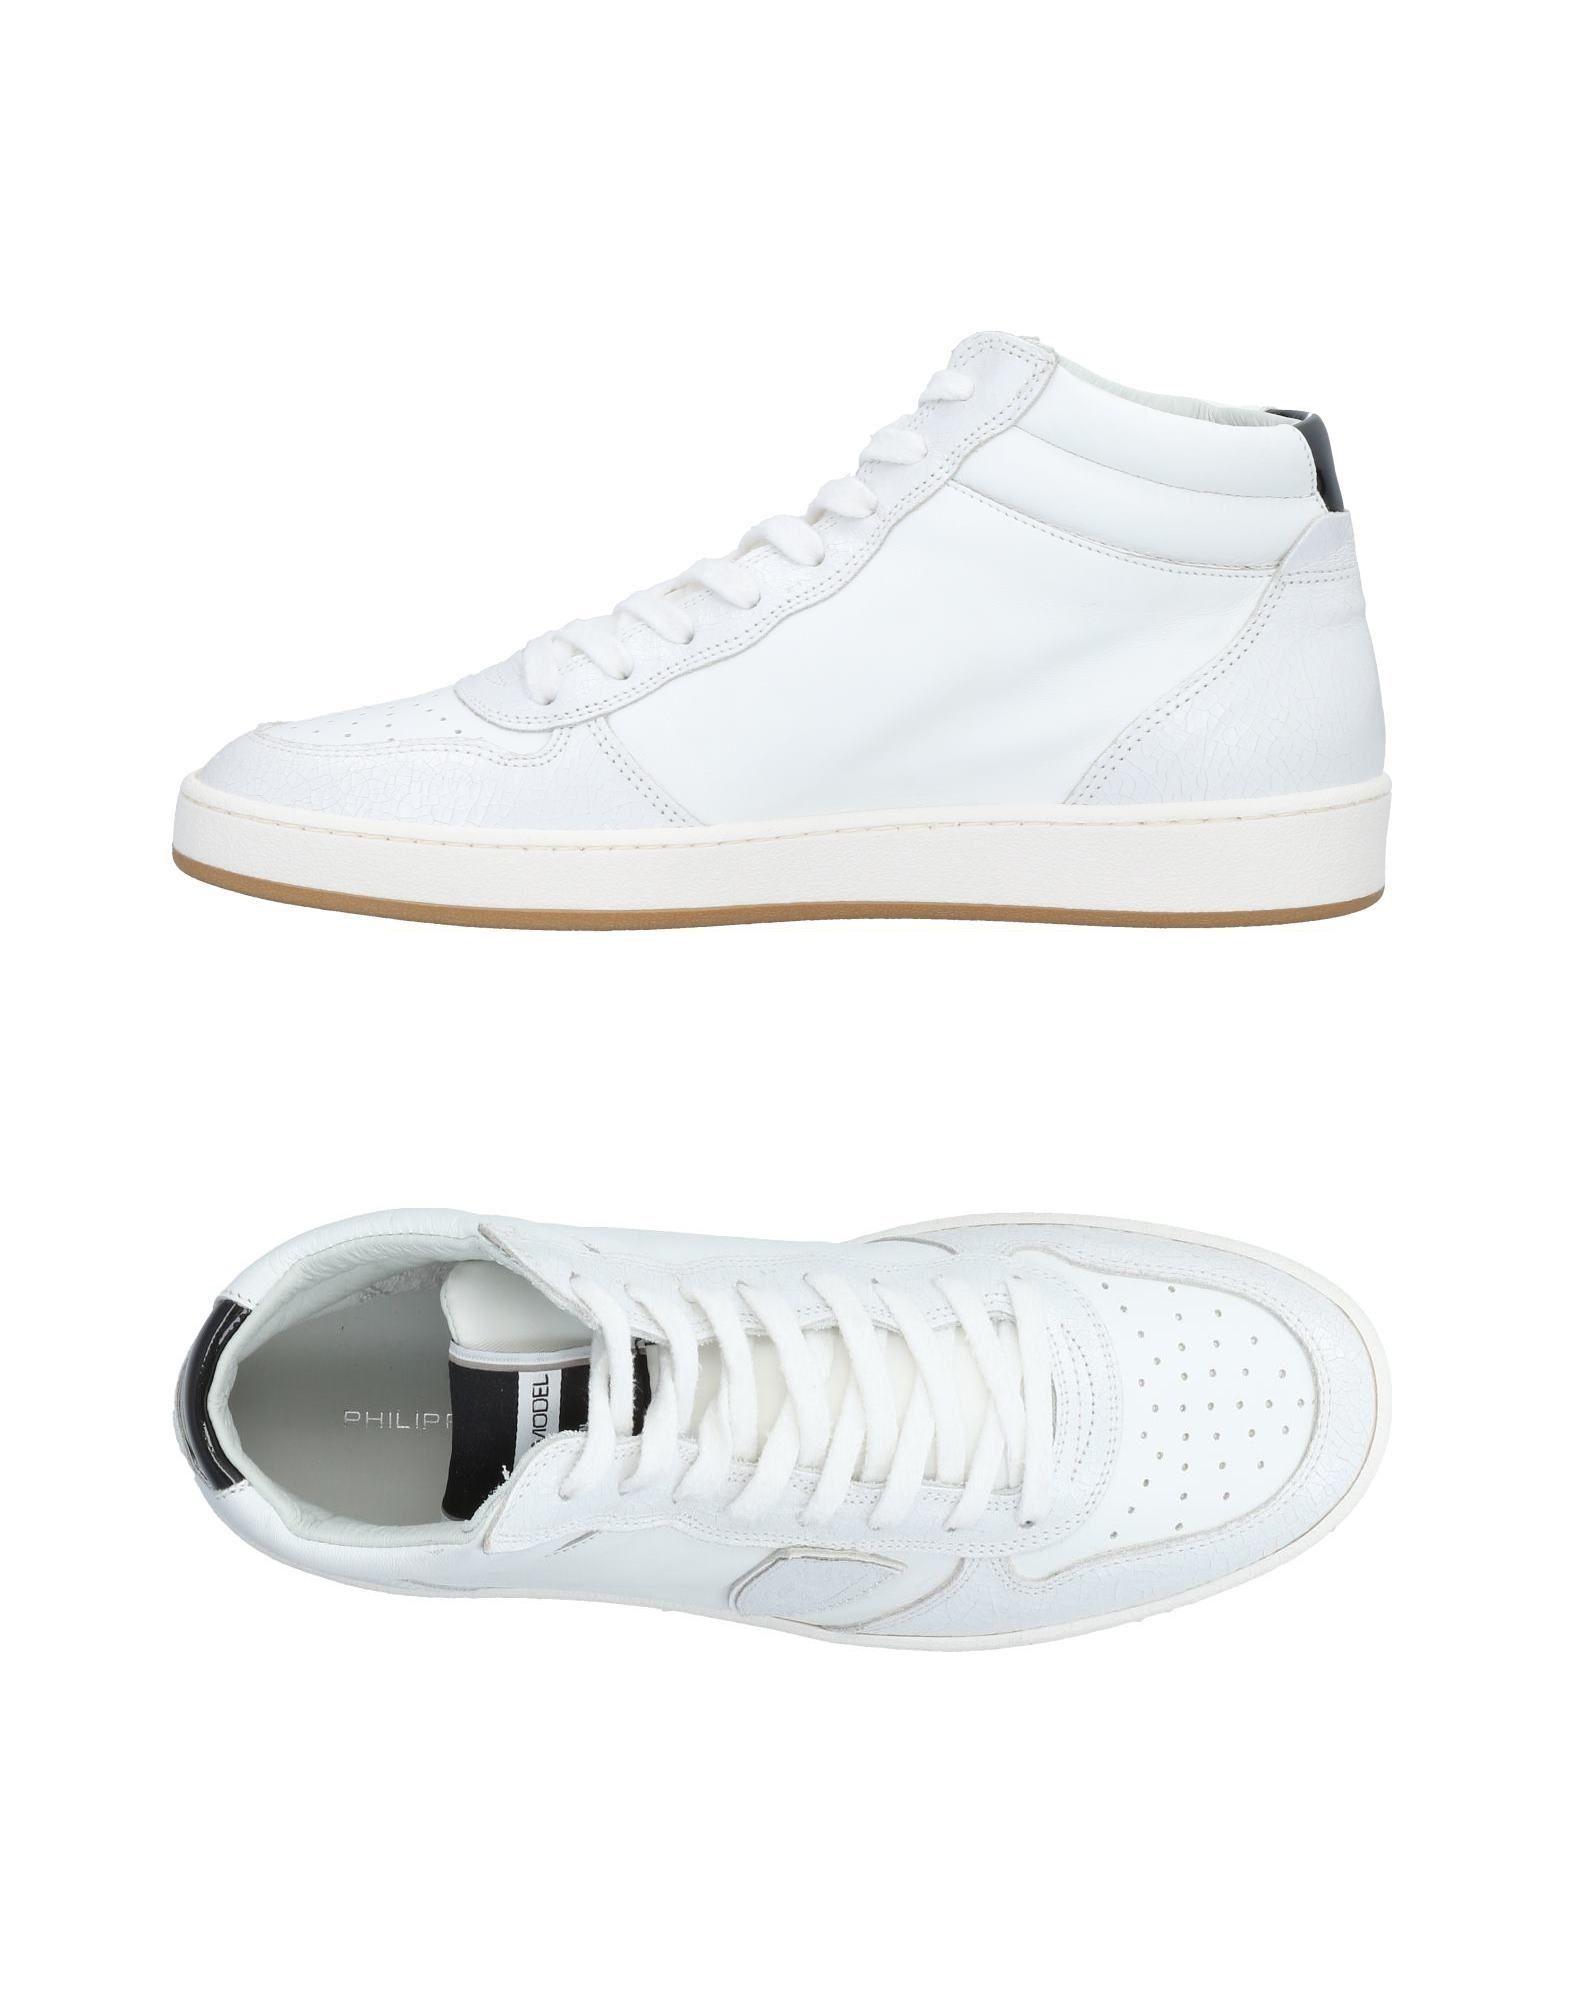 Philippe Model Sneakers Damen  11480963XFGut aussehende strapazierfähige Schuhe